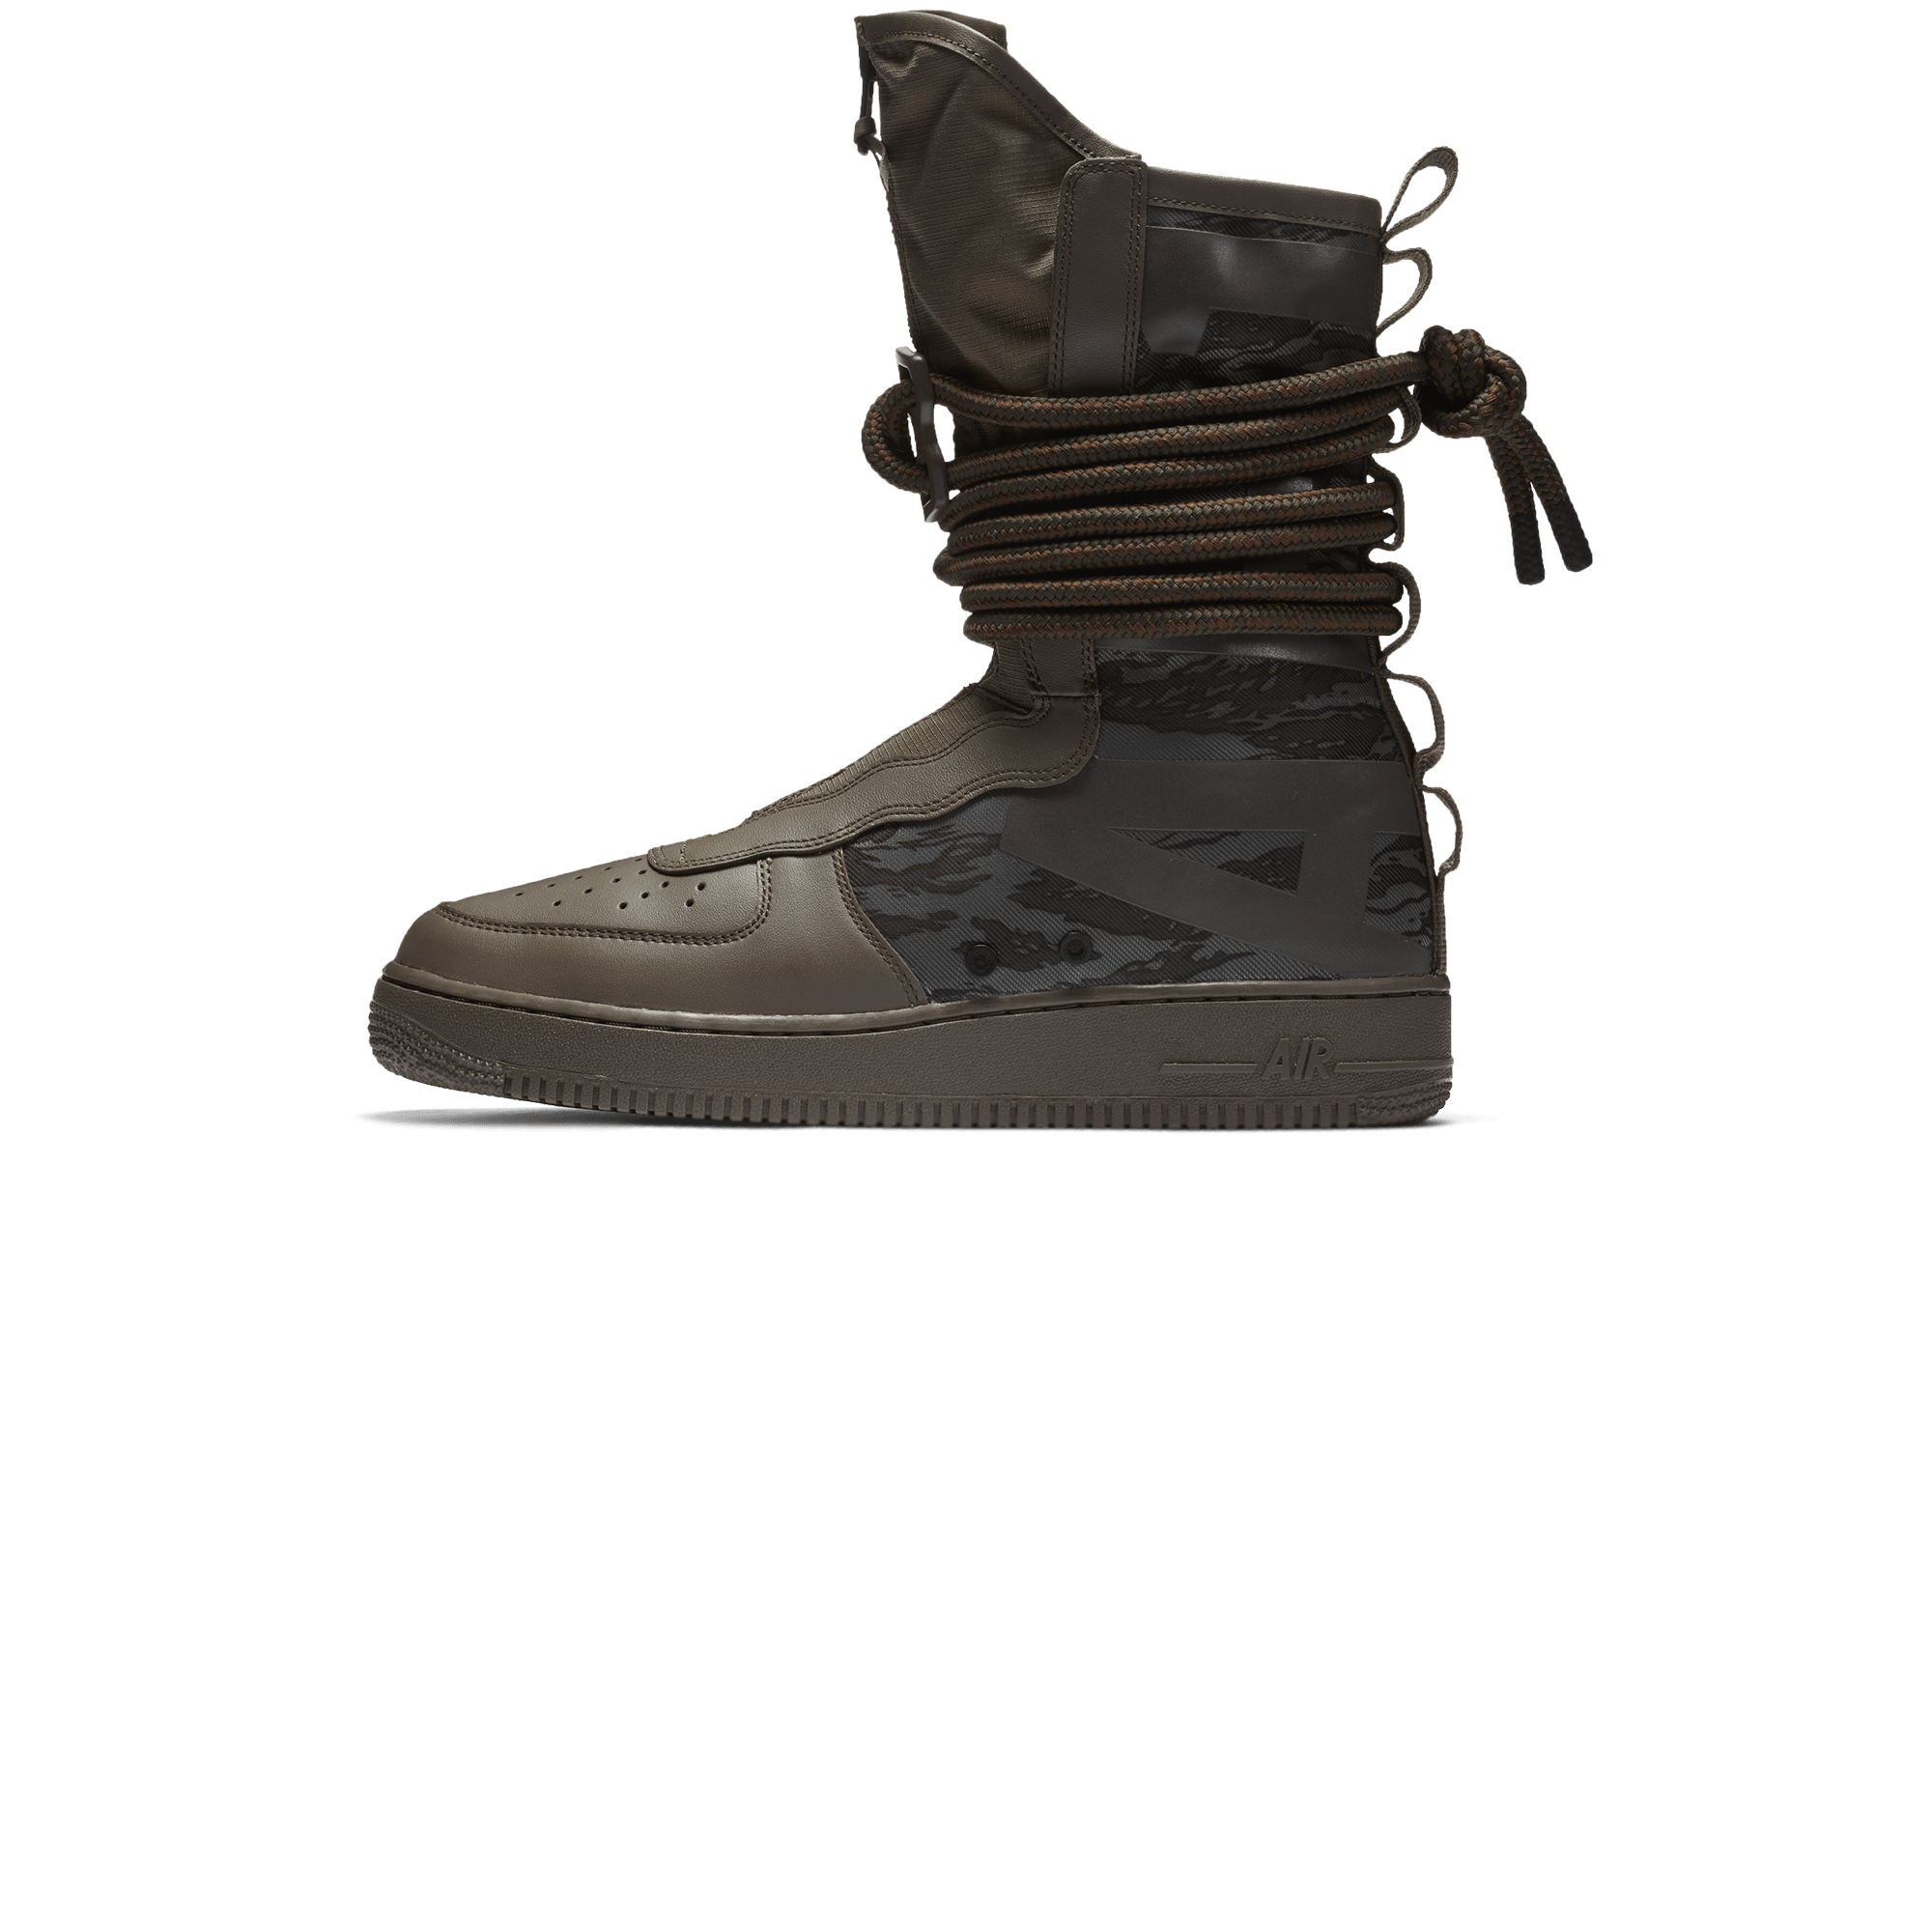 sale retailer 38dbb 5116d air force 1 hi boot uomo